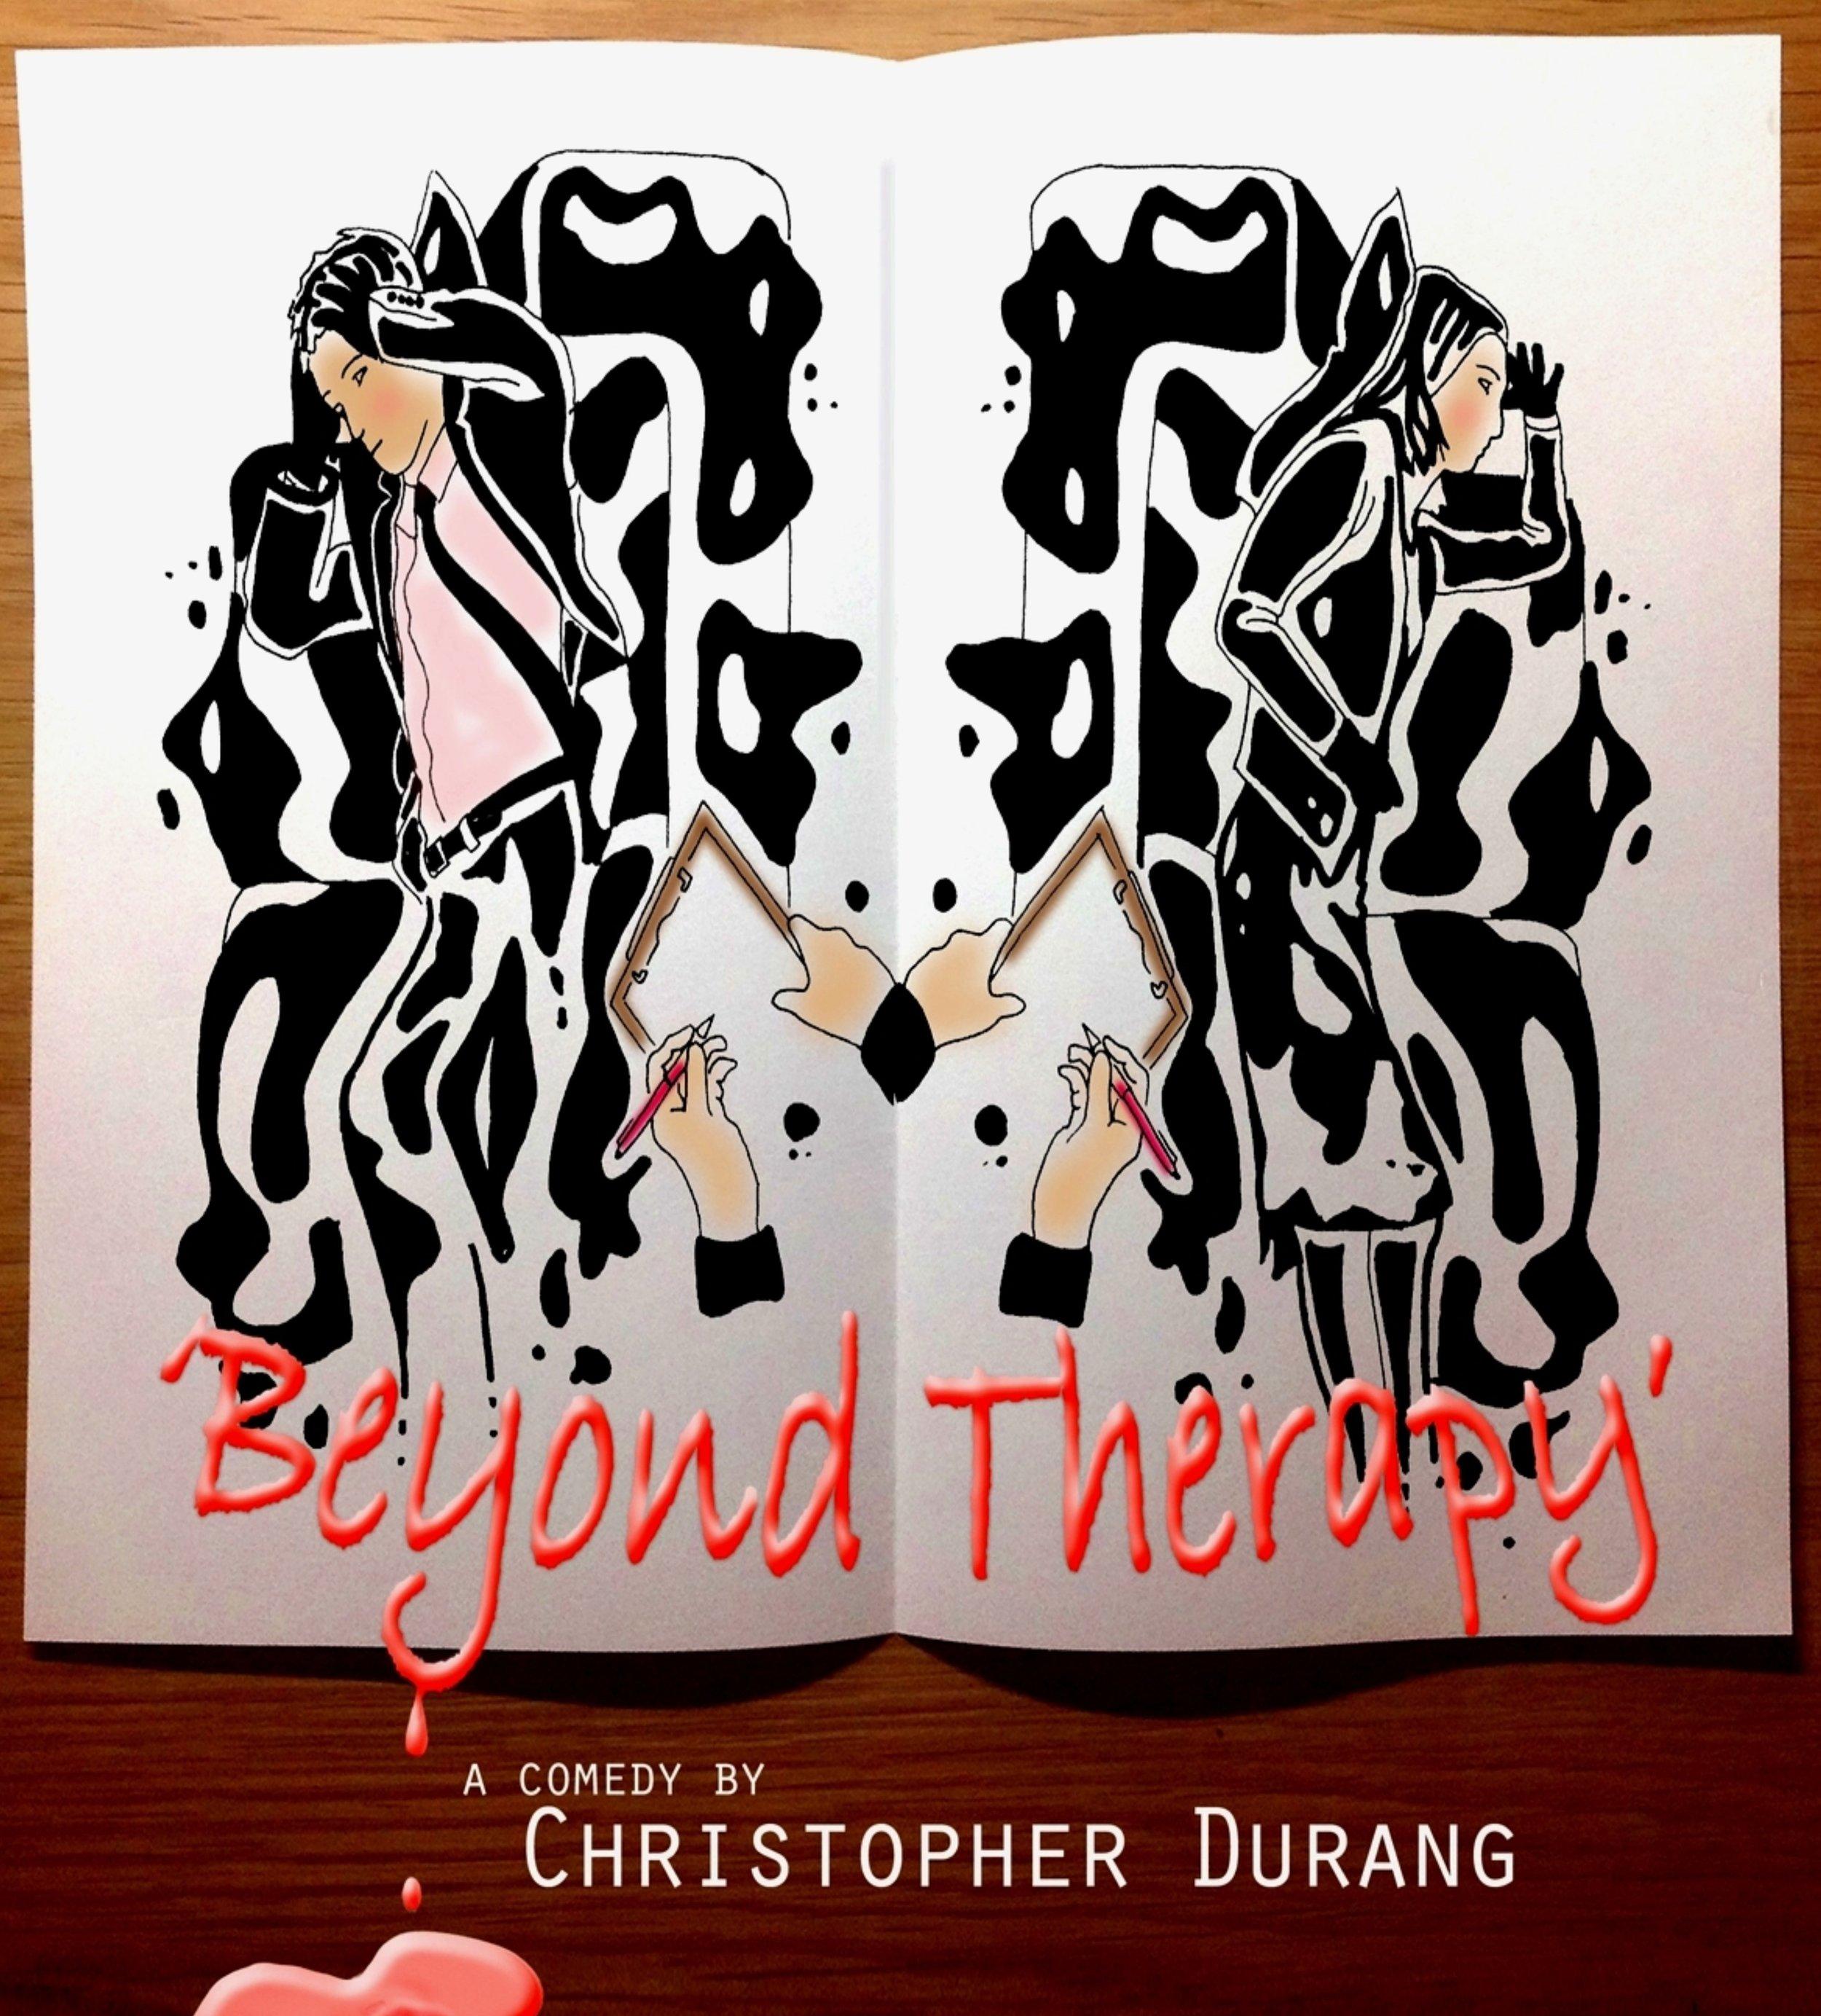 Beyond Therapy web image.jpg